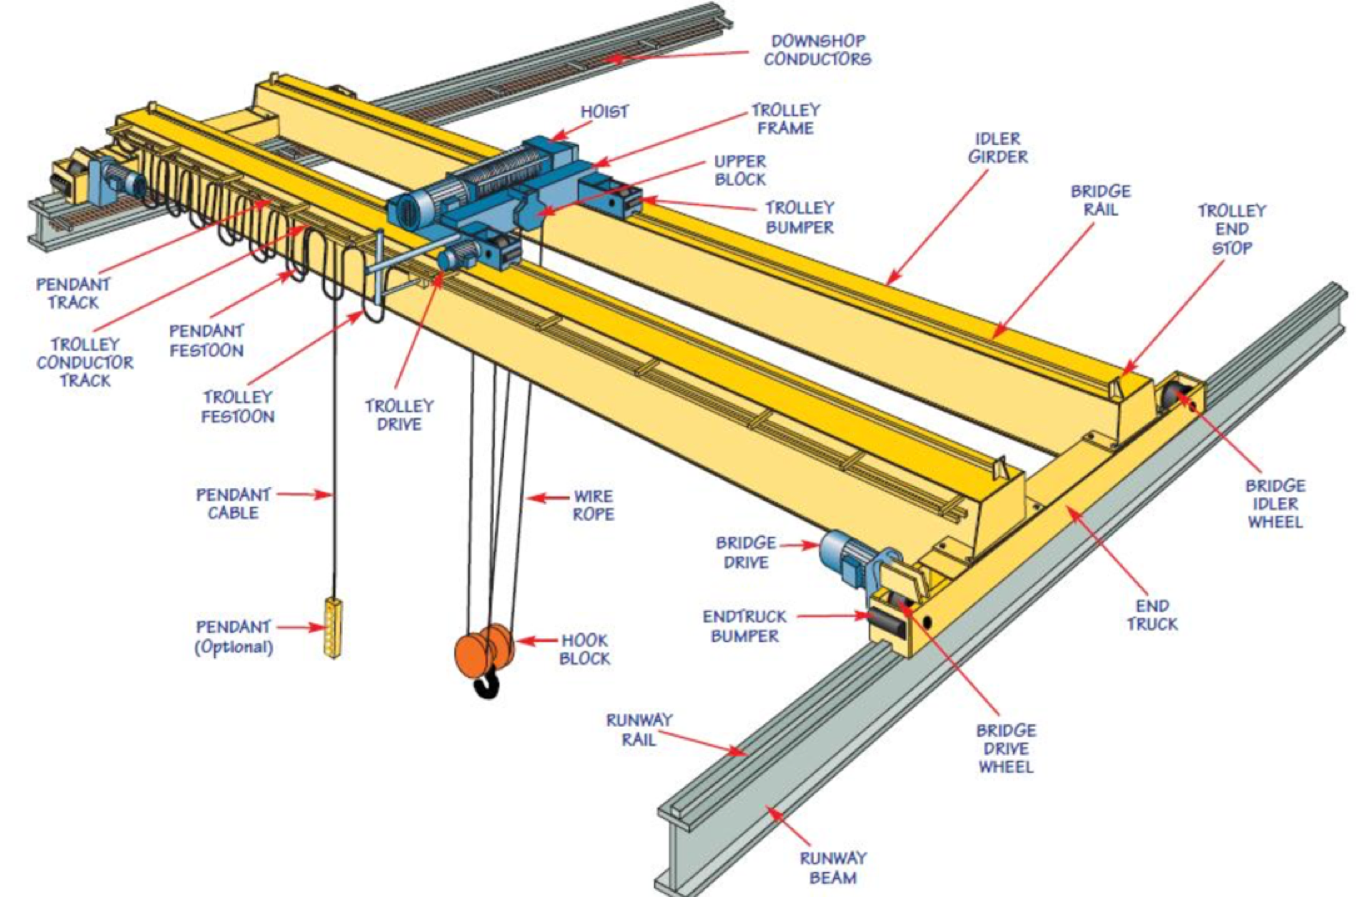 Pictorial guide to OSHA Crane Terminology — Overhead Crane Consulting, LLCOverhead Crane Consulting, LLC